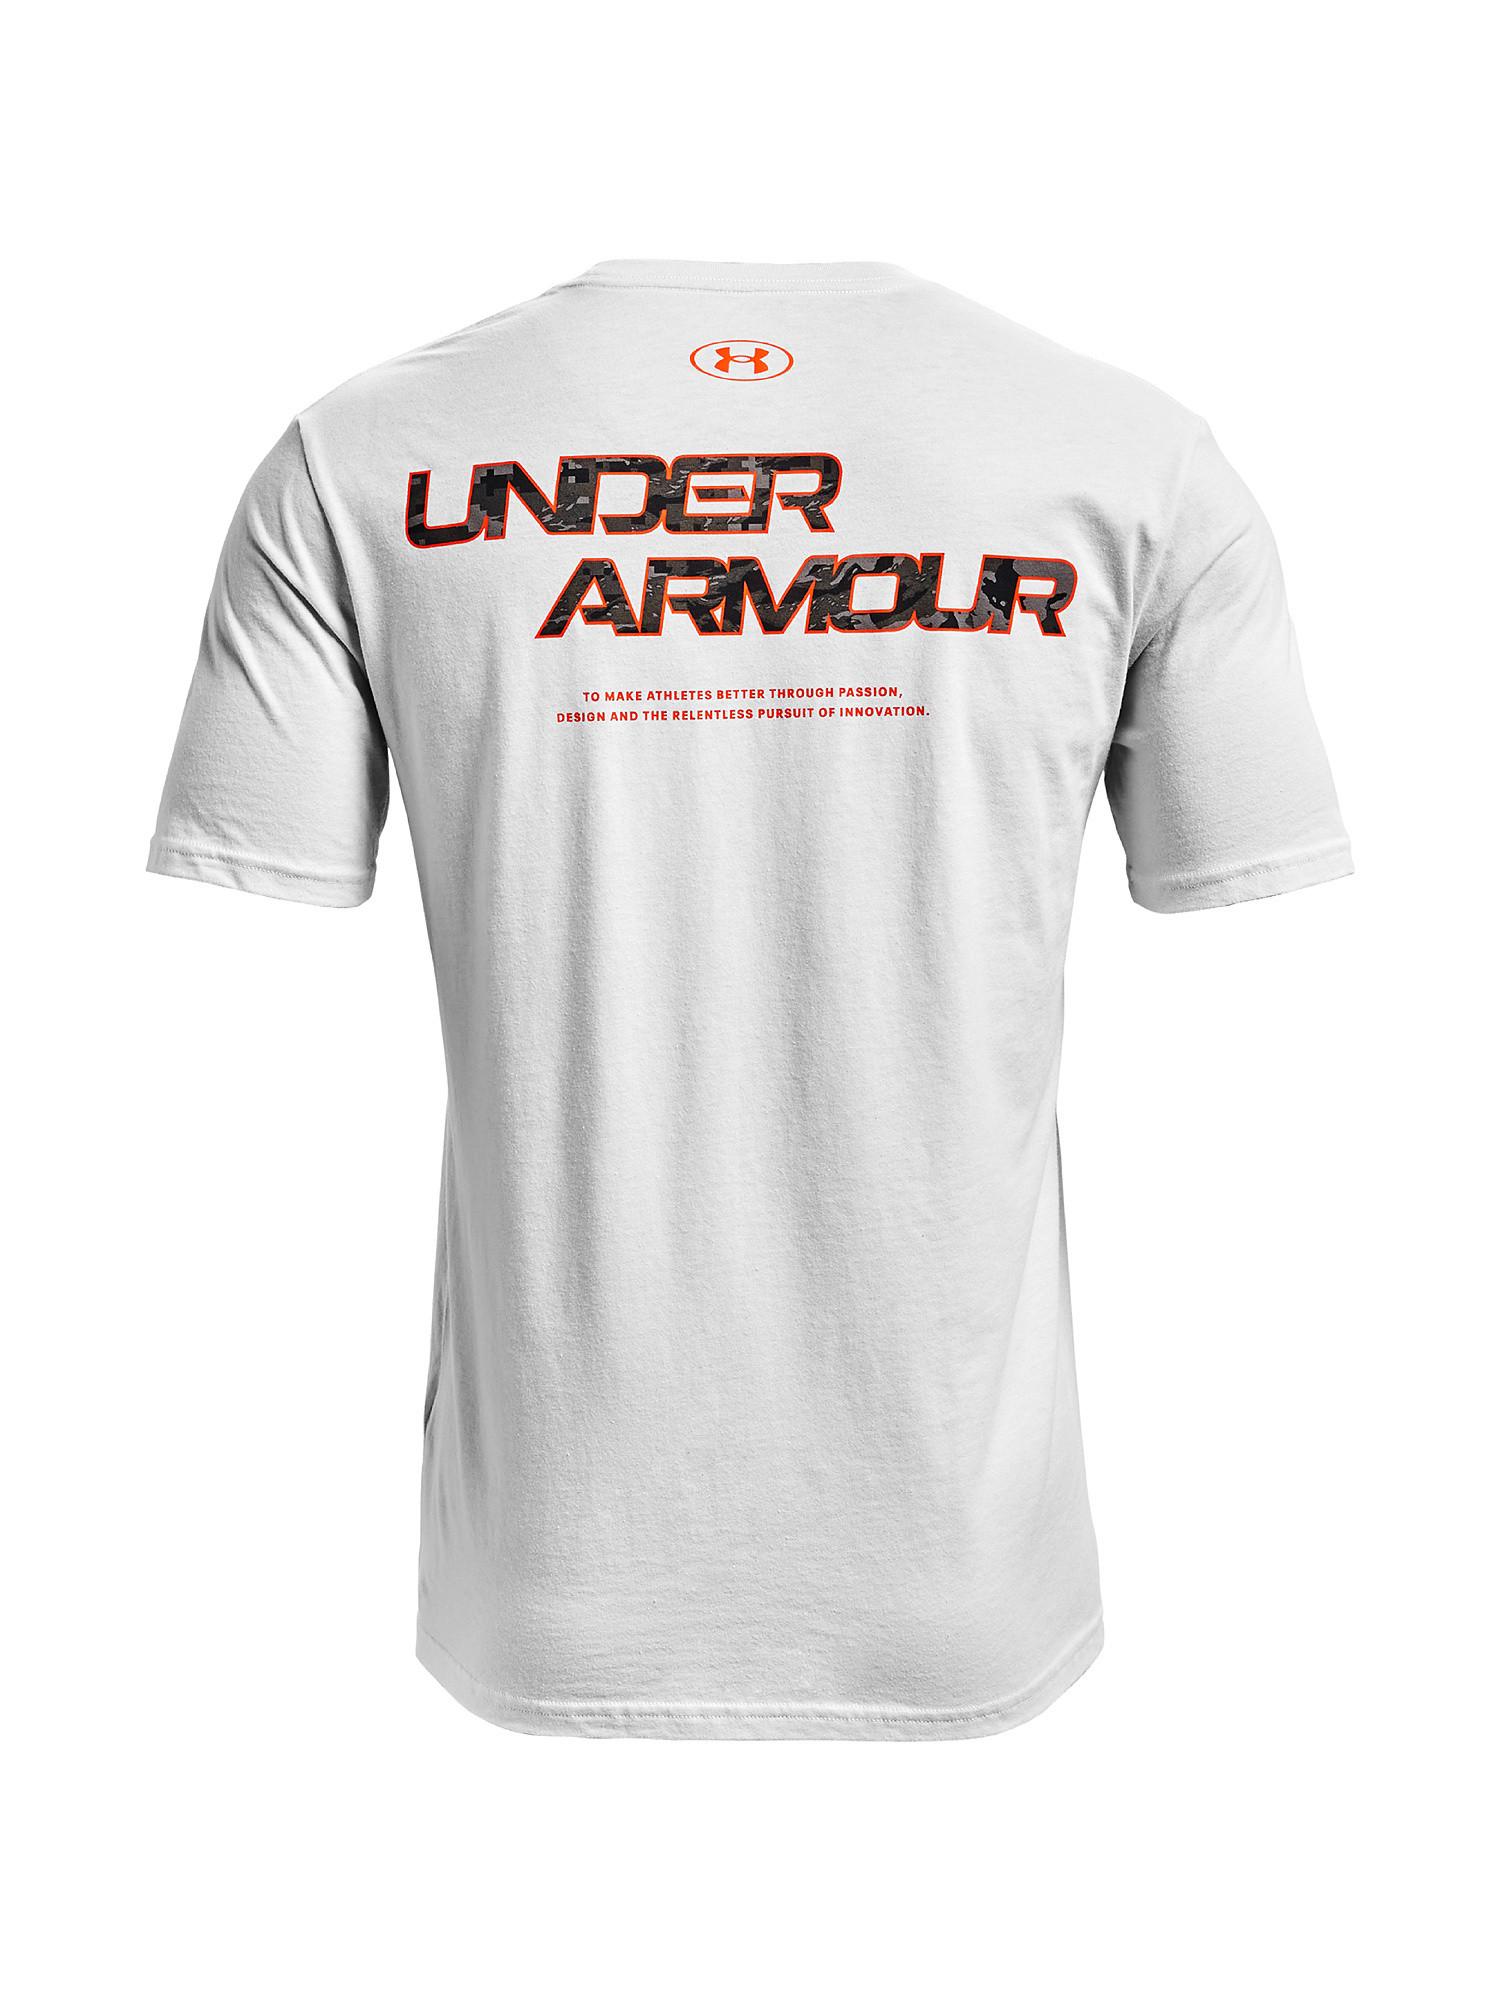 T-shirt sportiva uomo , Grigio, large image number 1